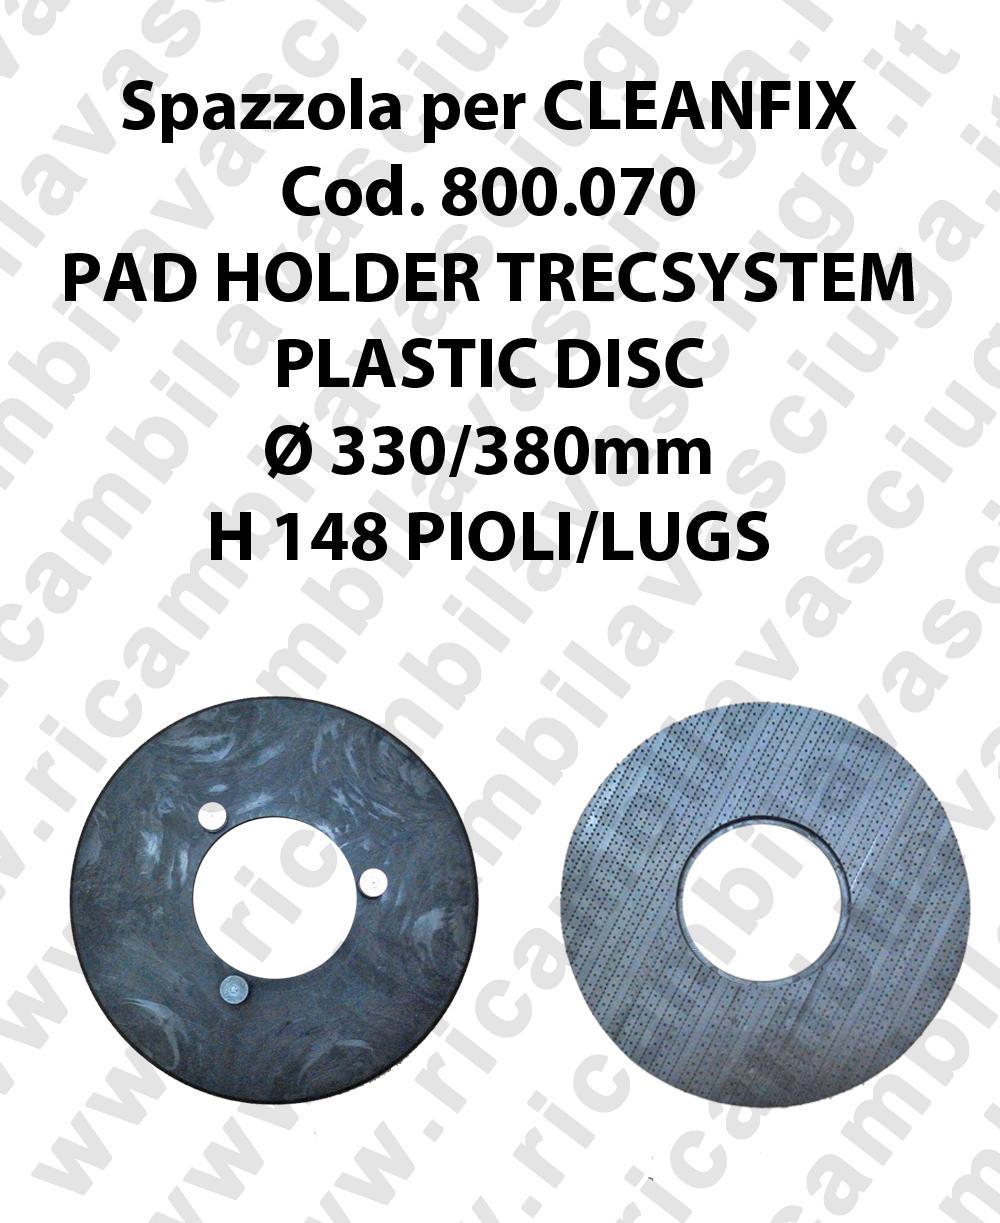 PAD HOLDER TRECSYSTEM  for scrubber dryer CLEANFIX Code 800.070